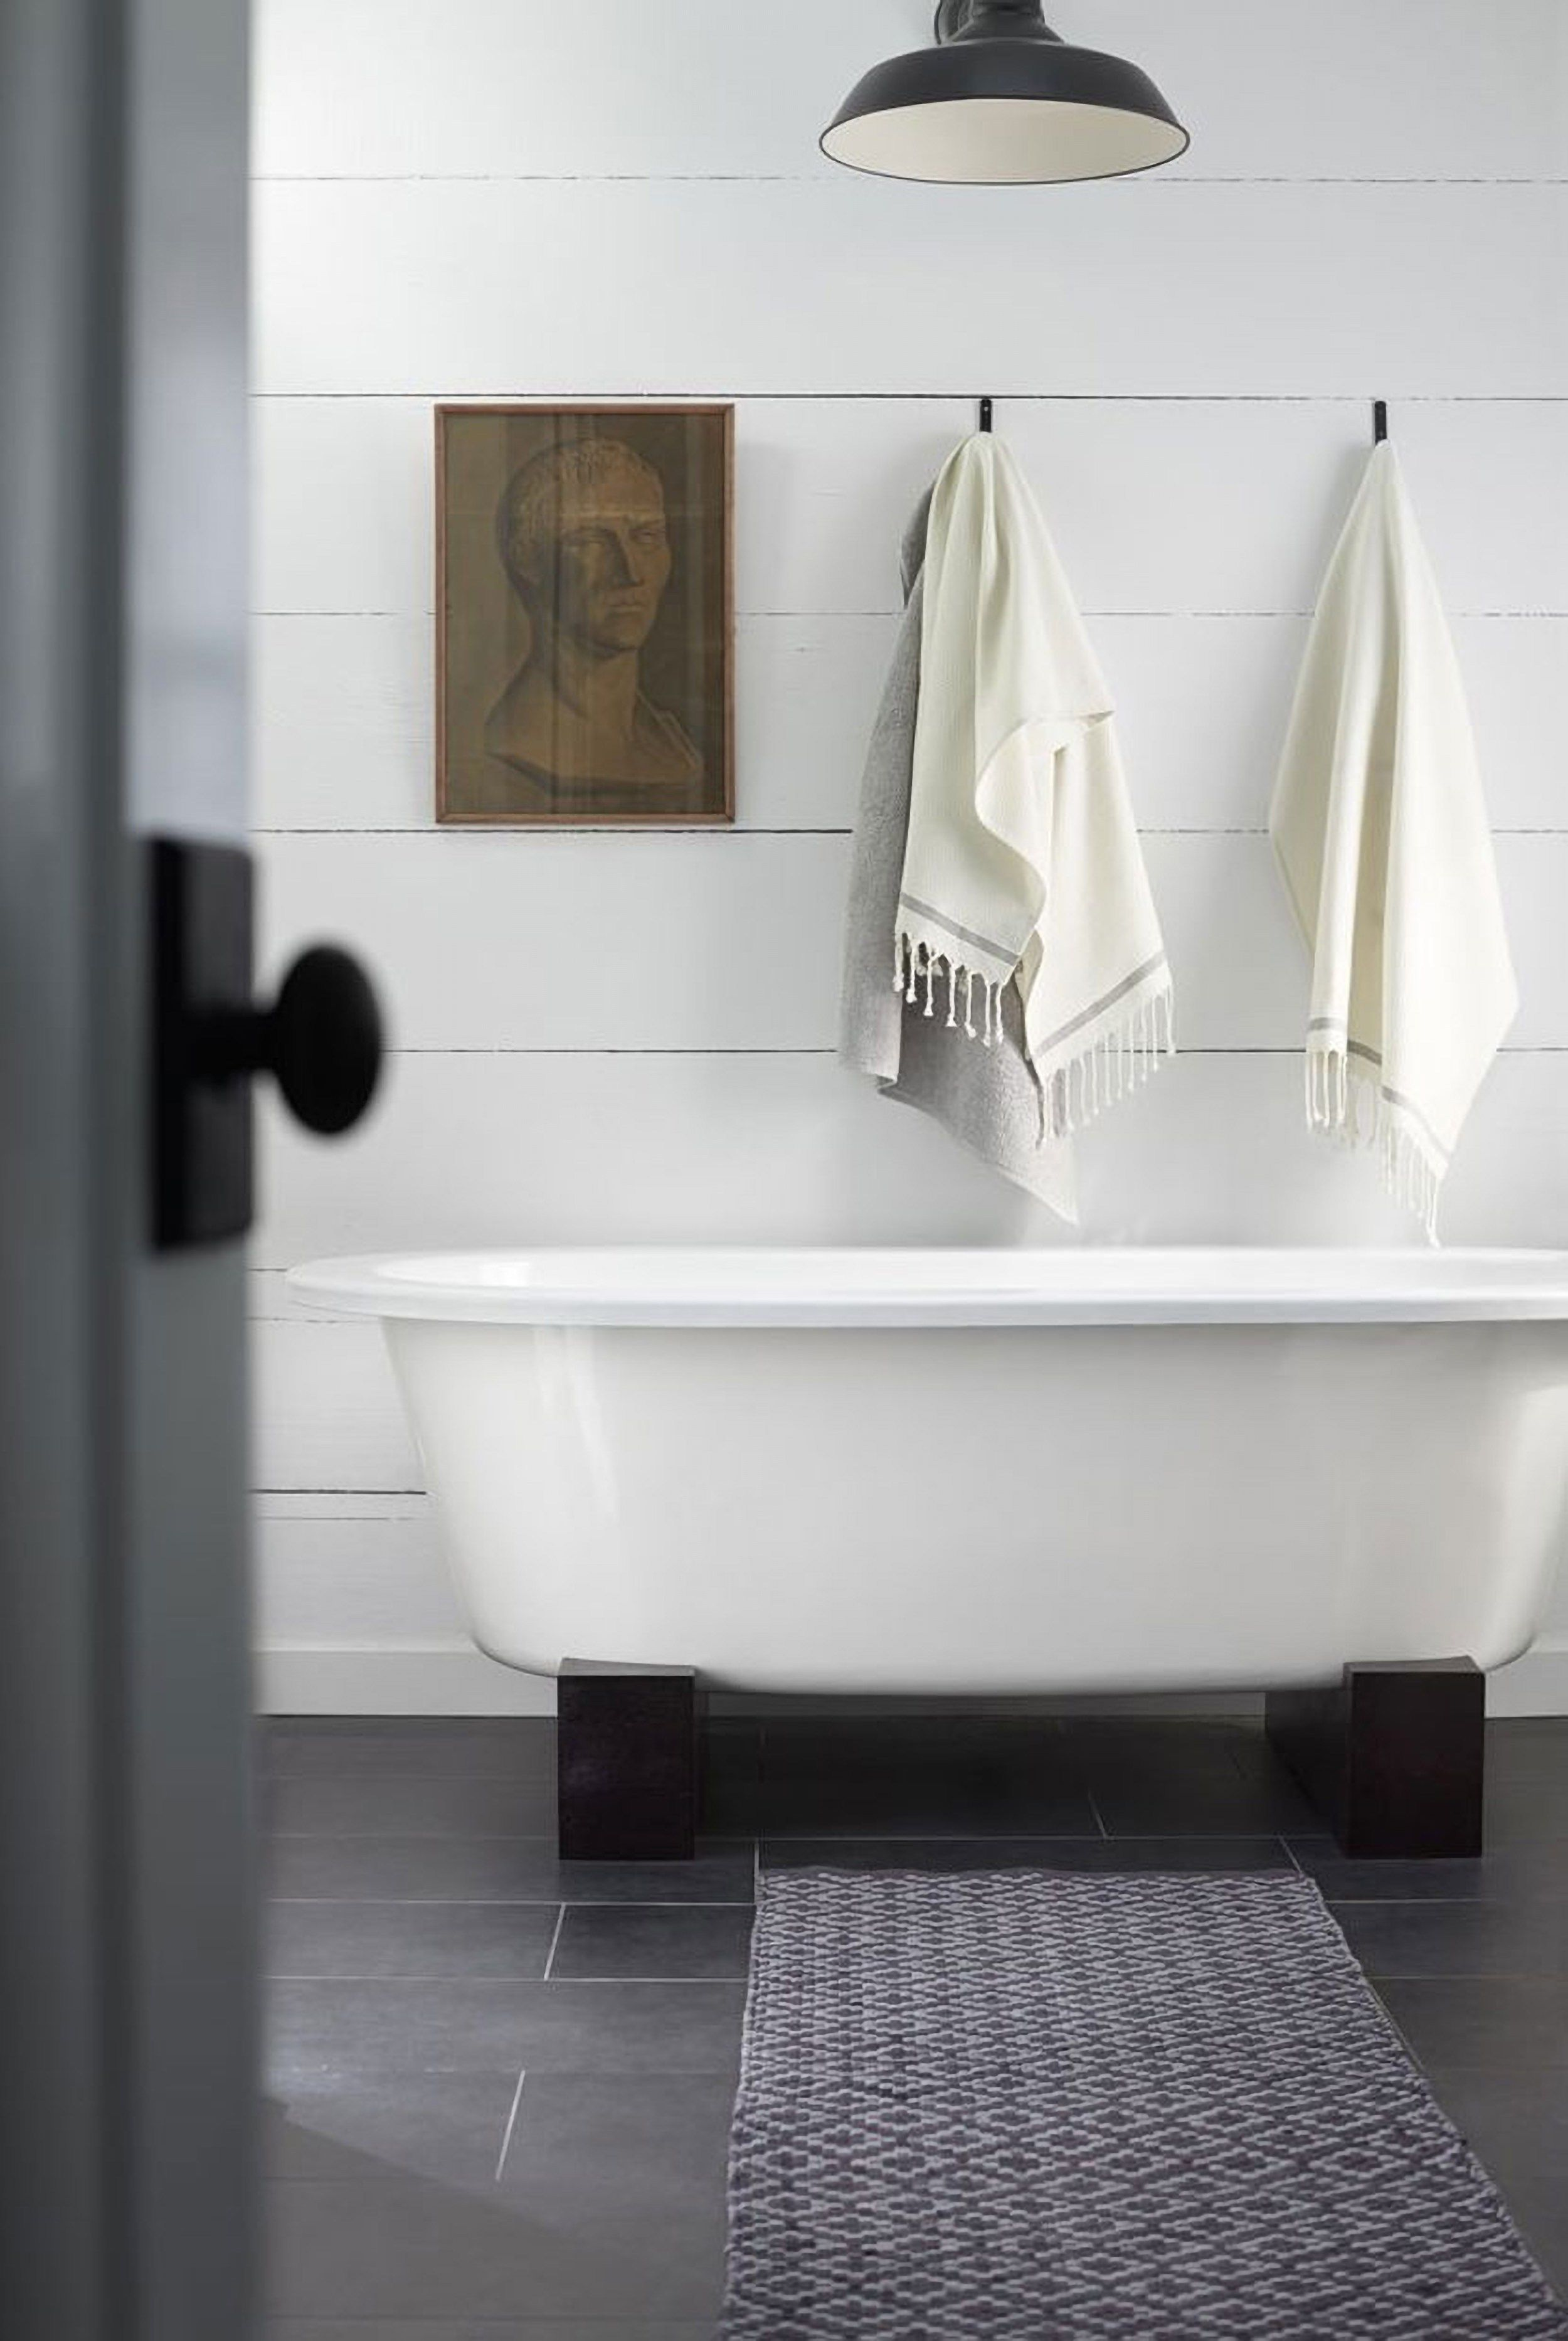 Modern Farmhouse Bathroom With Freestanding Tub